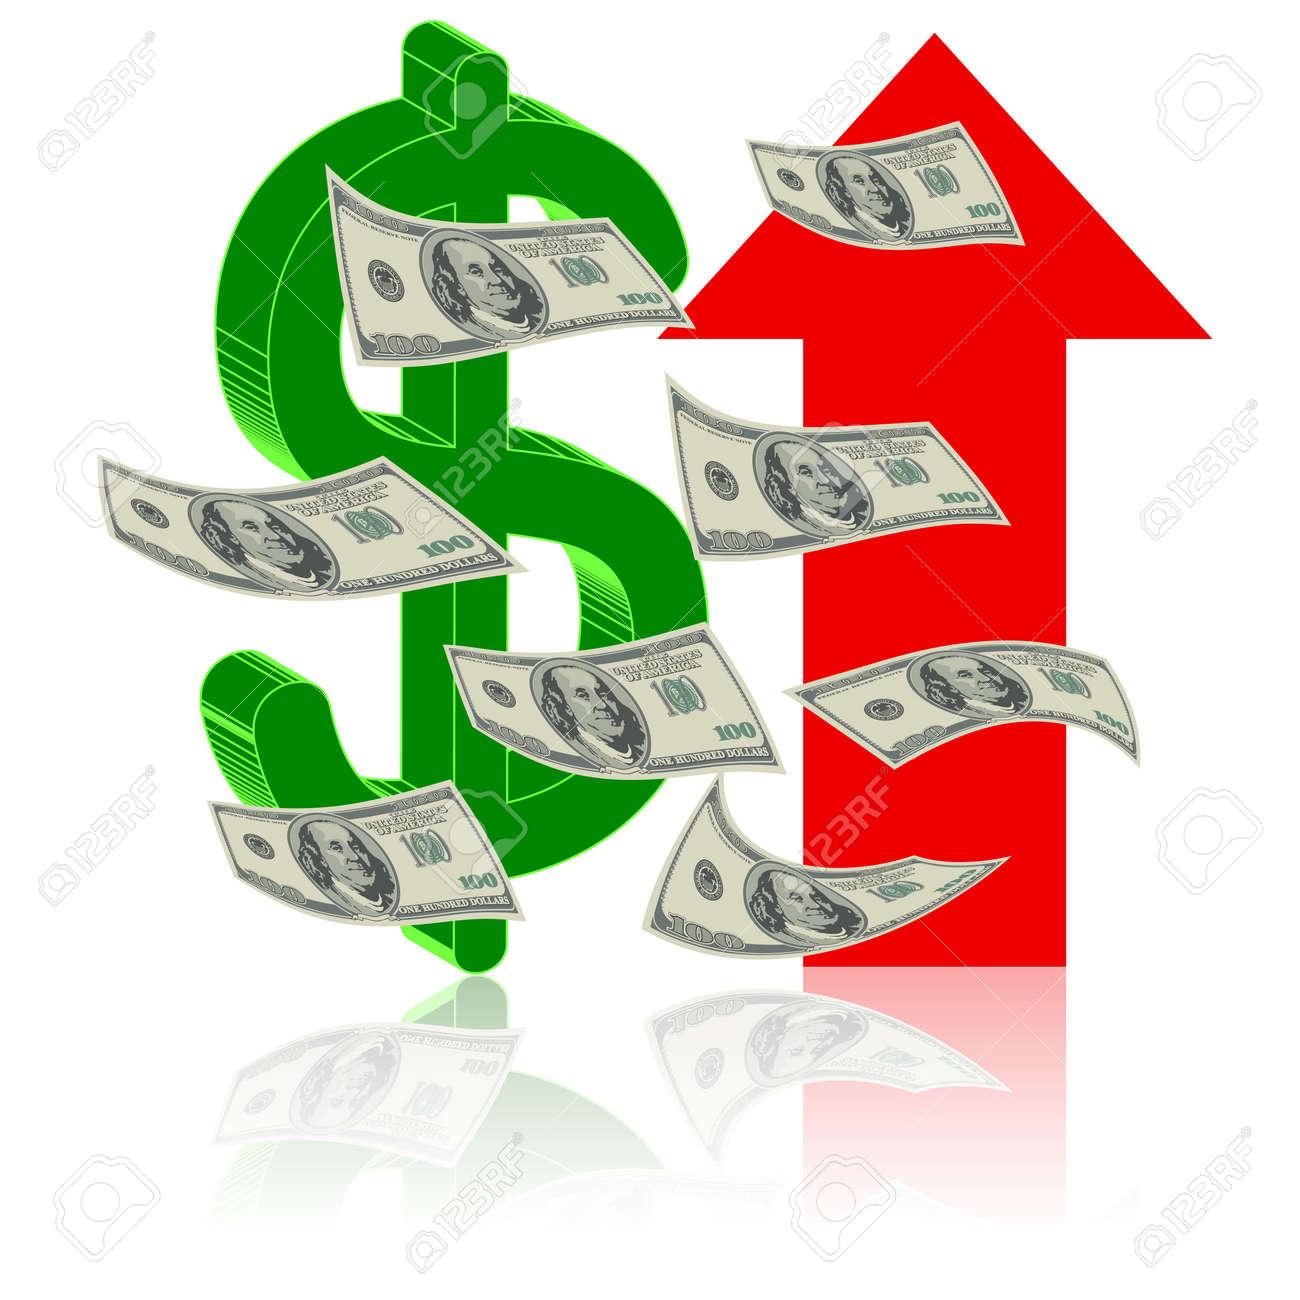 Height finance dollar up arrow symbol symbol of success height finance dollar up arrow symbol symbol of success stock vector 14375178 buycottarizona Images